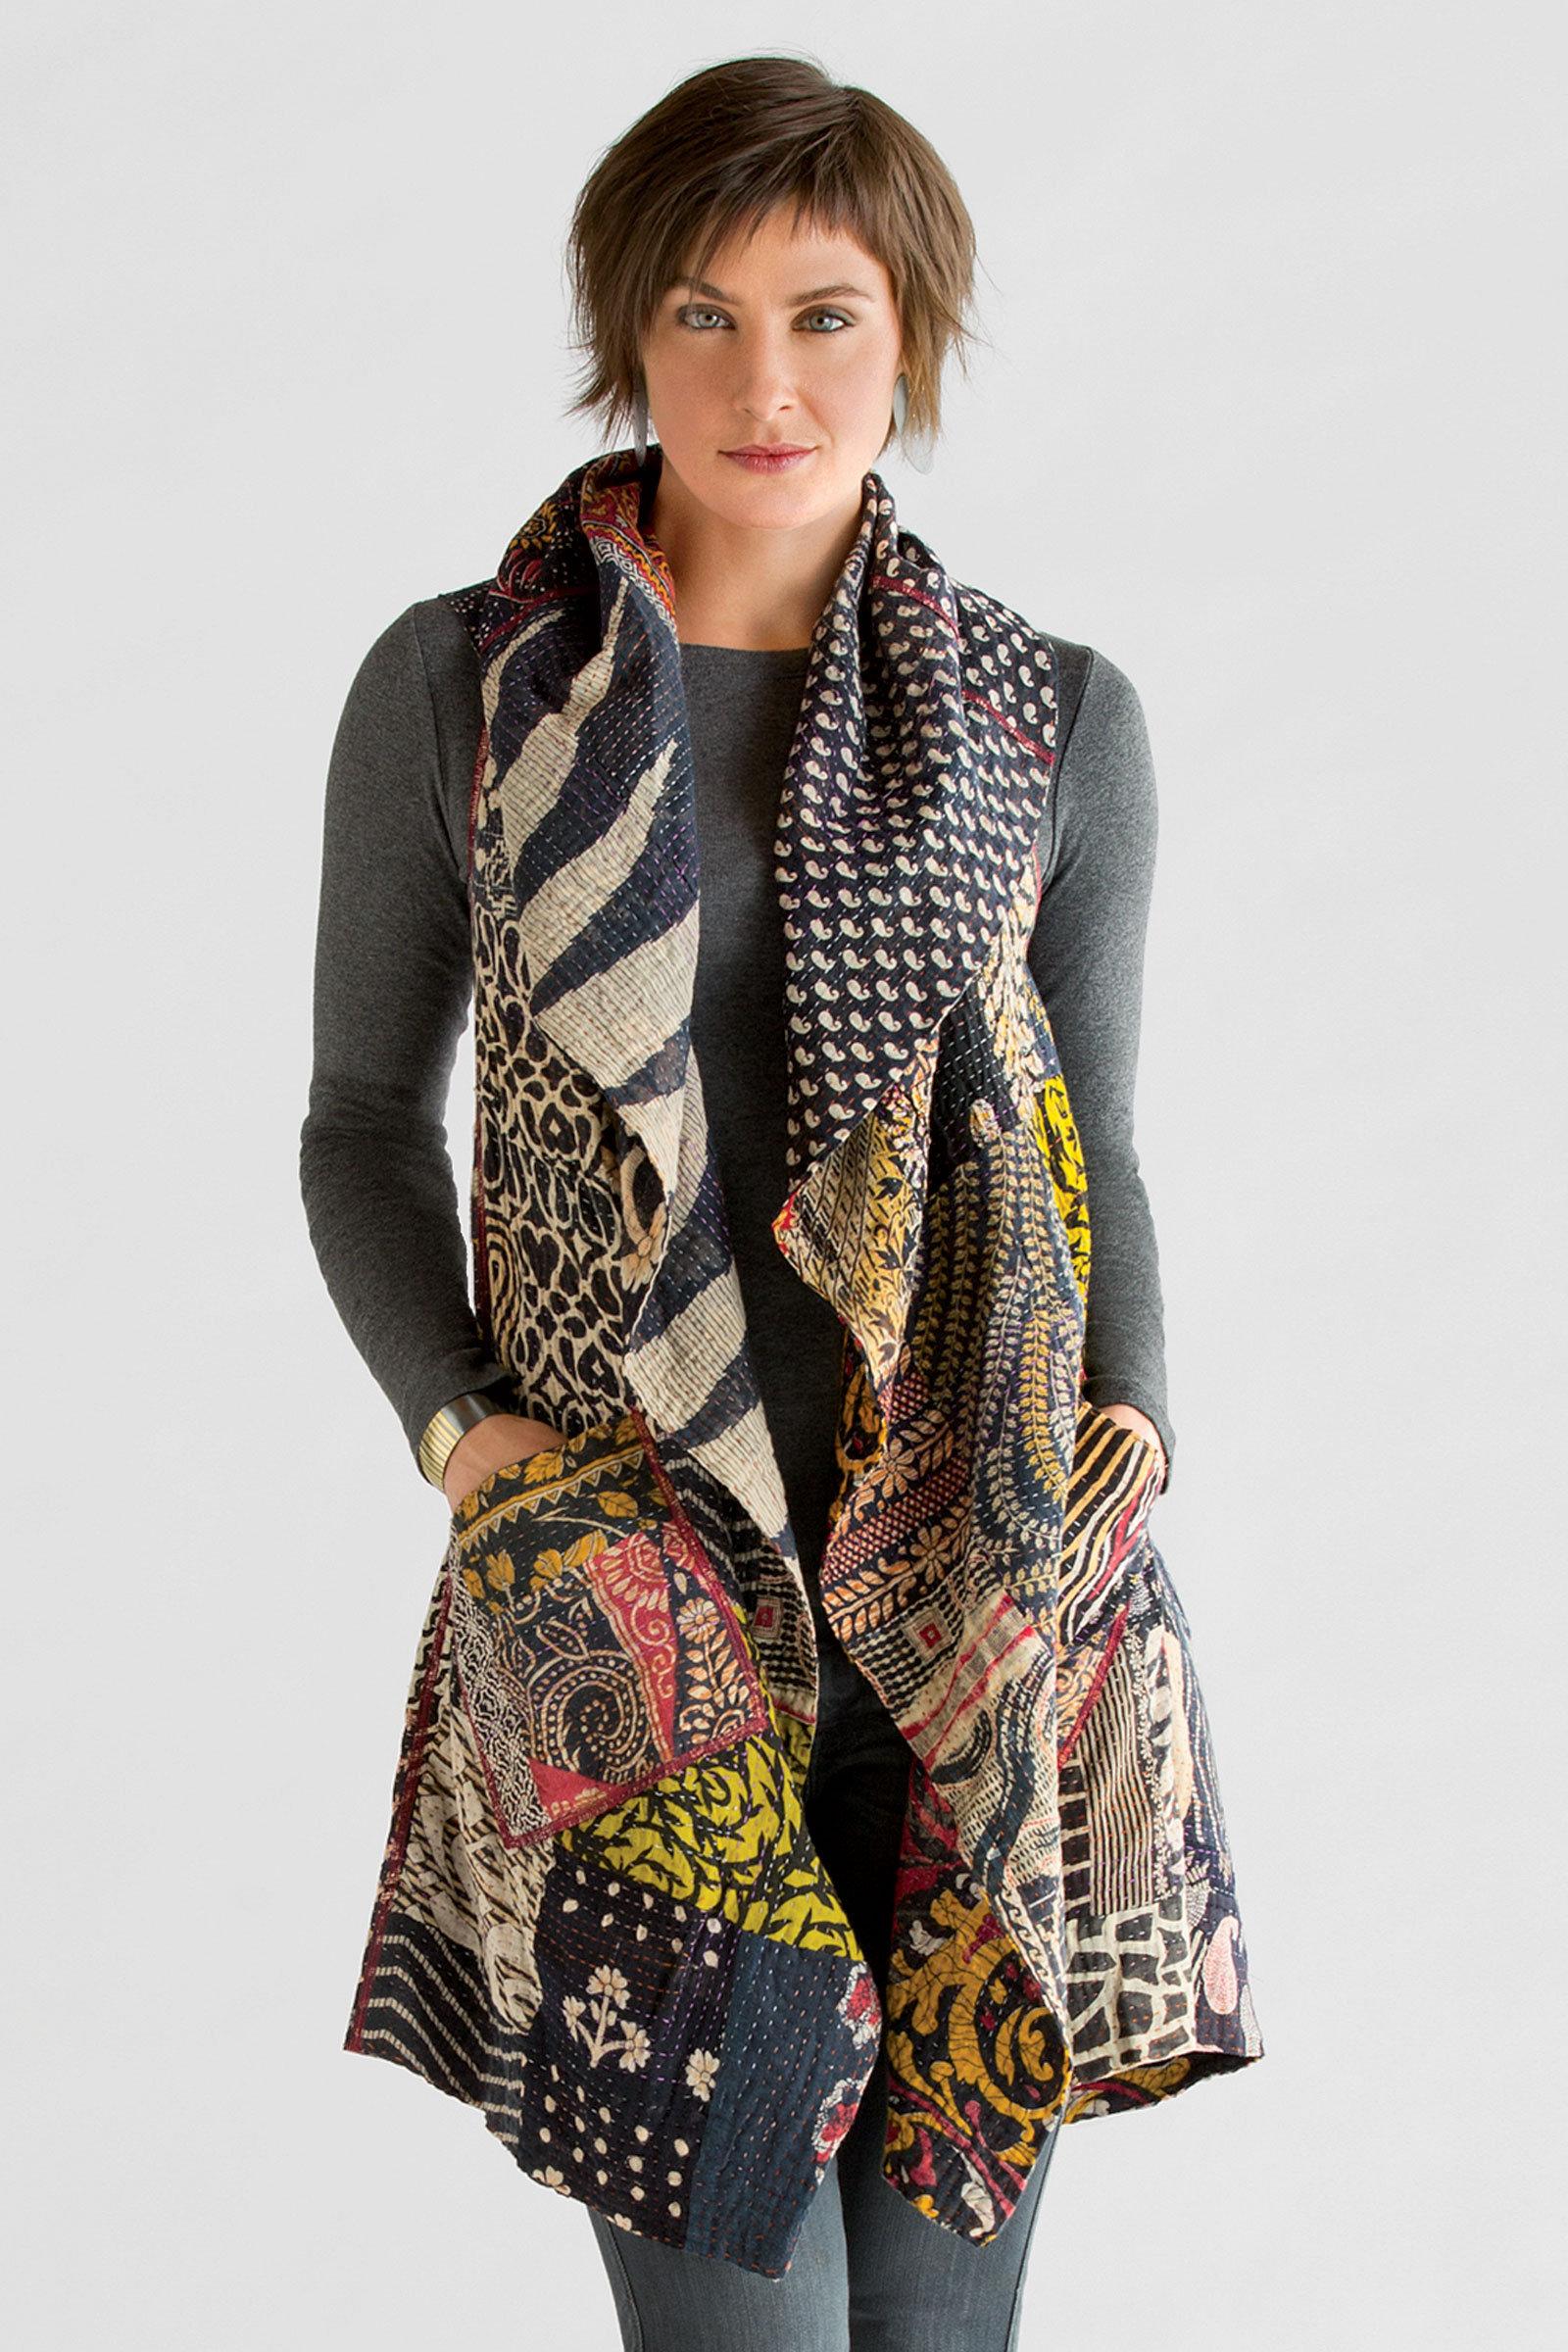 Kantha patchwork vest by mieko mintz cotton